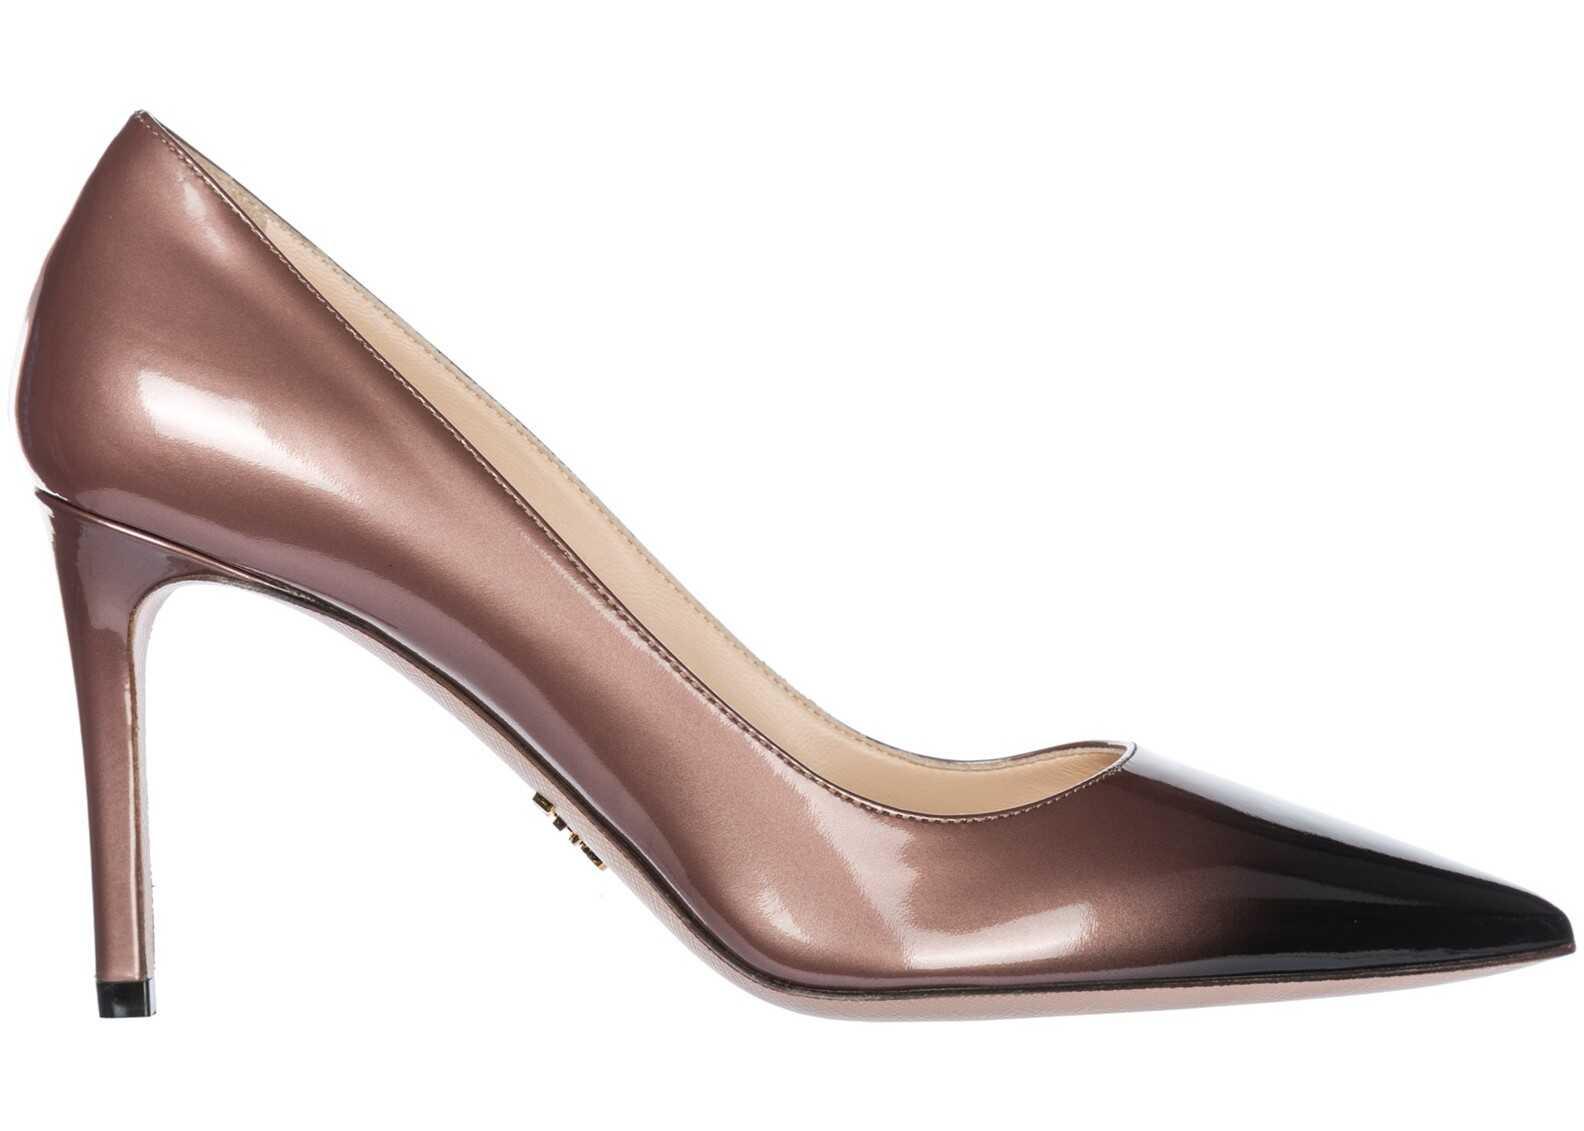 Prada High Heel Pink